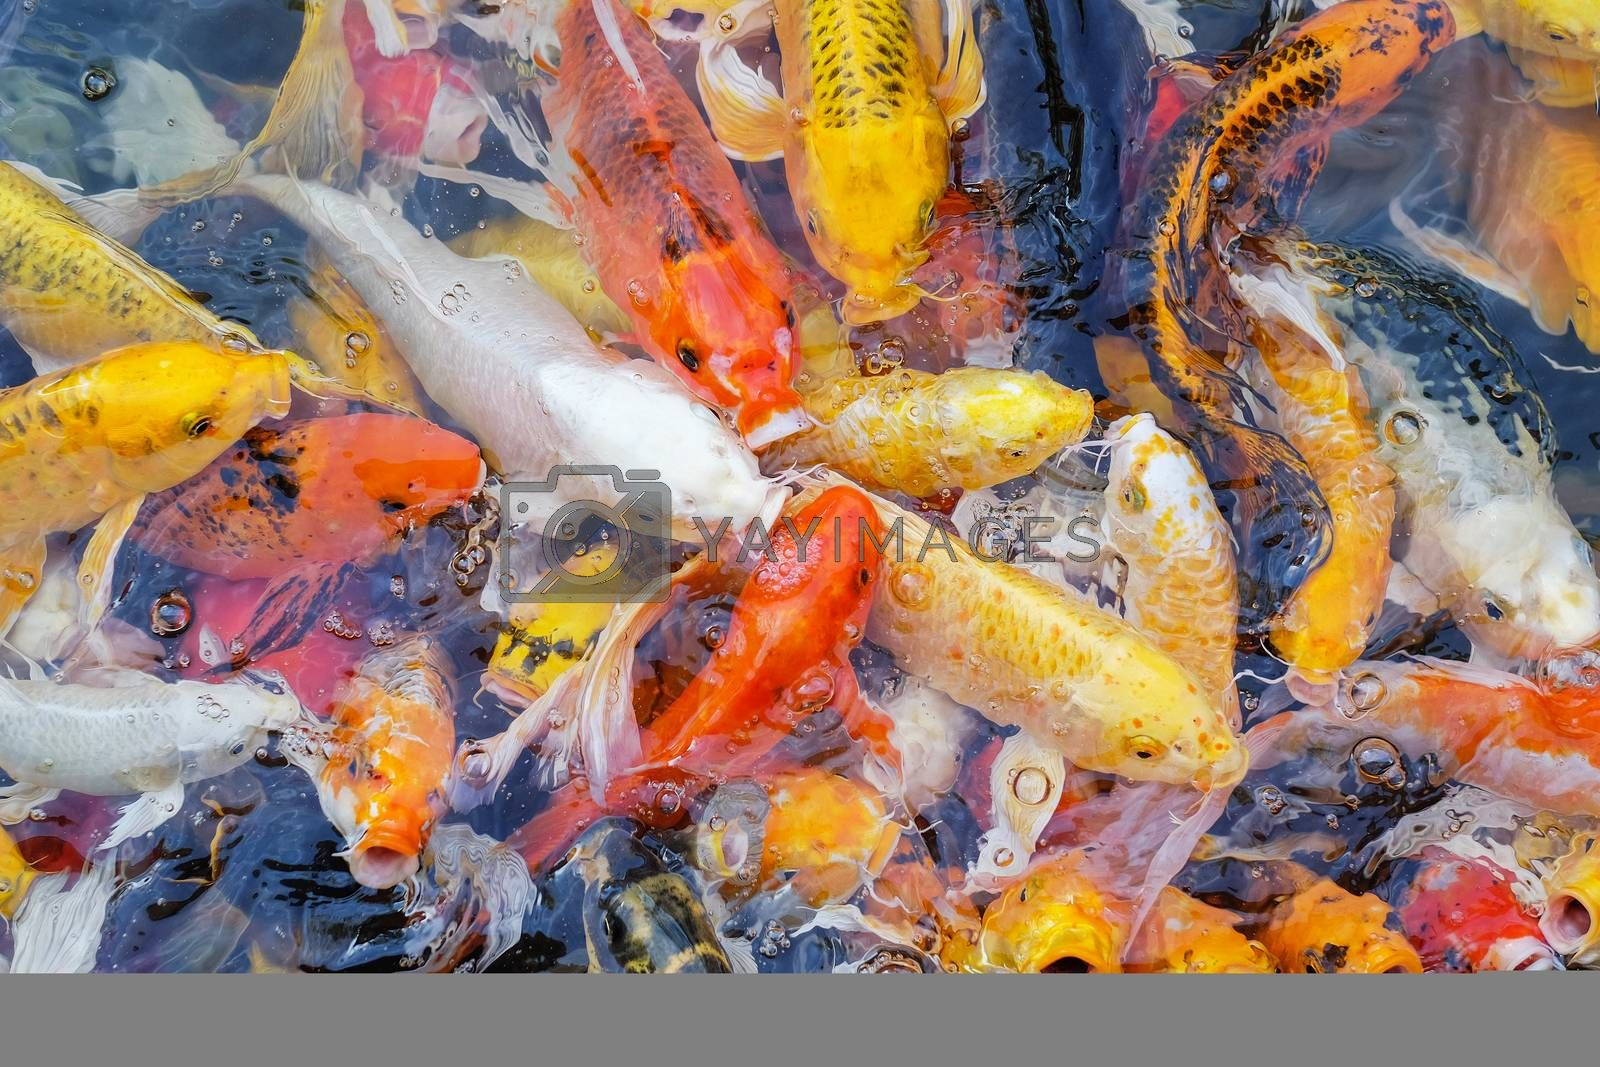 Colorful fancy carp fish, koi fish